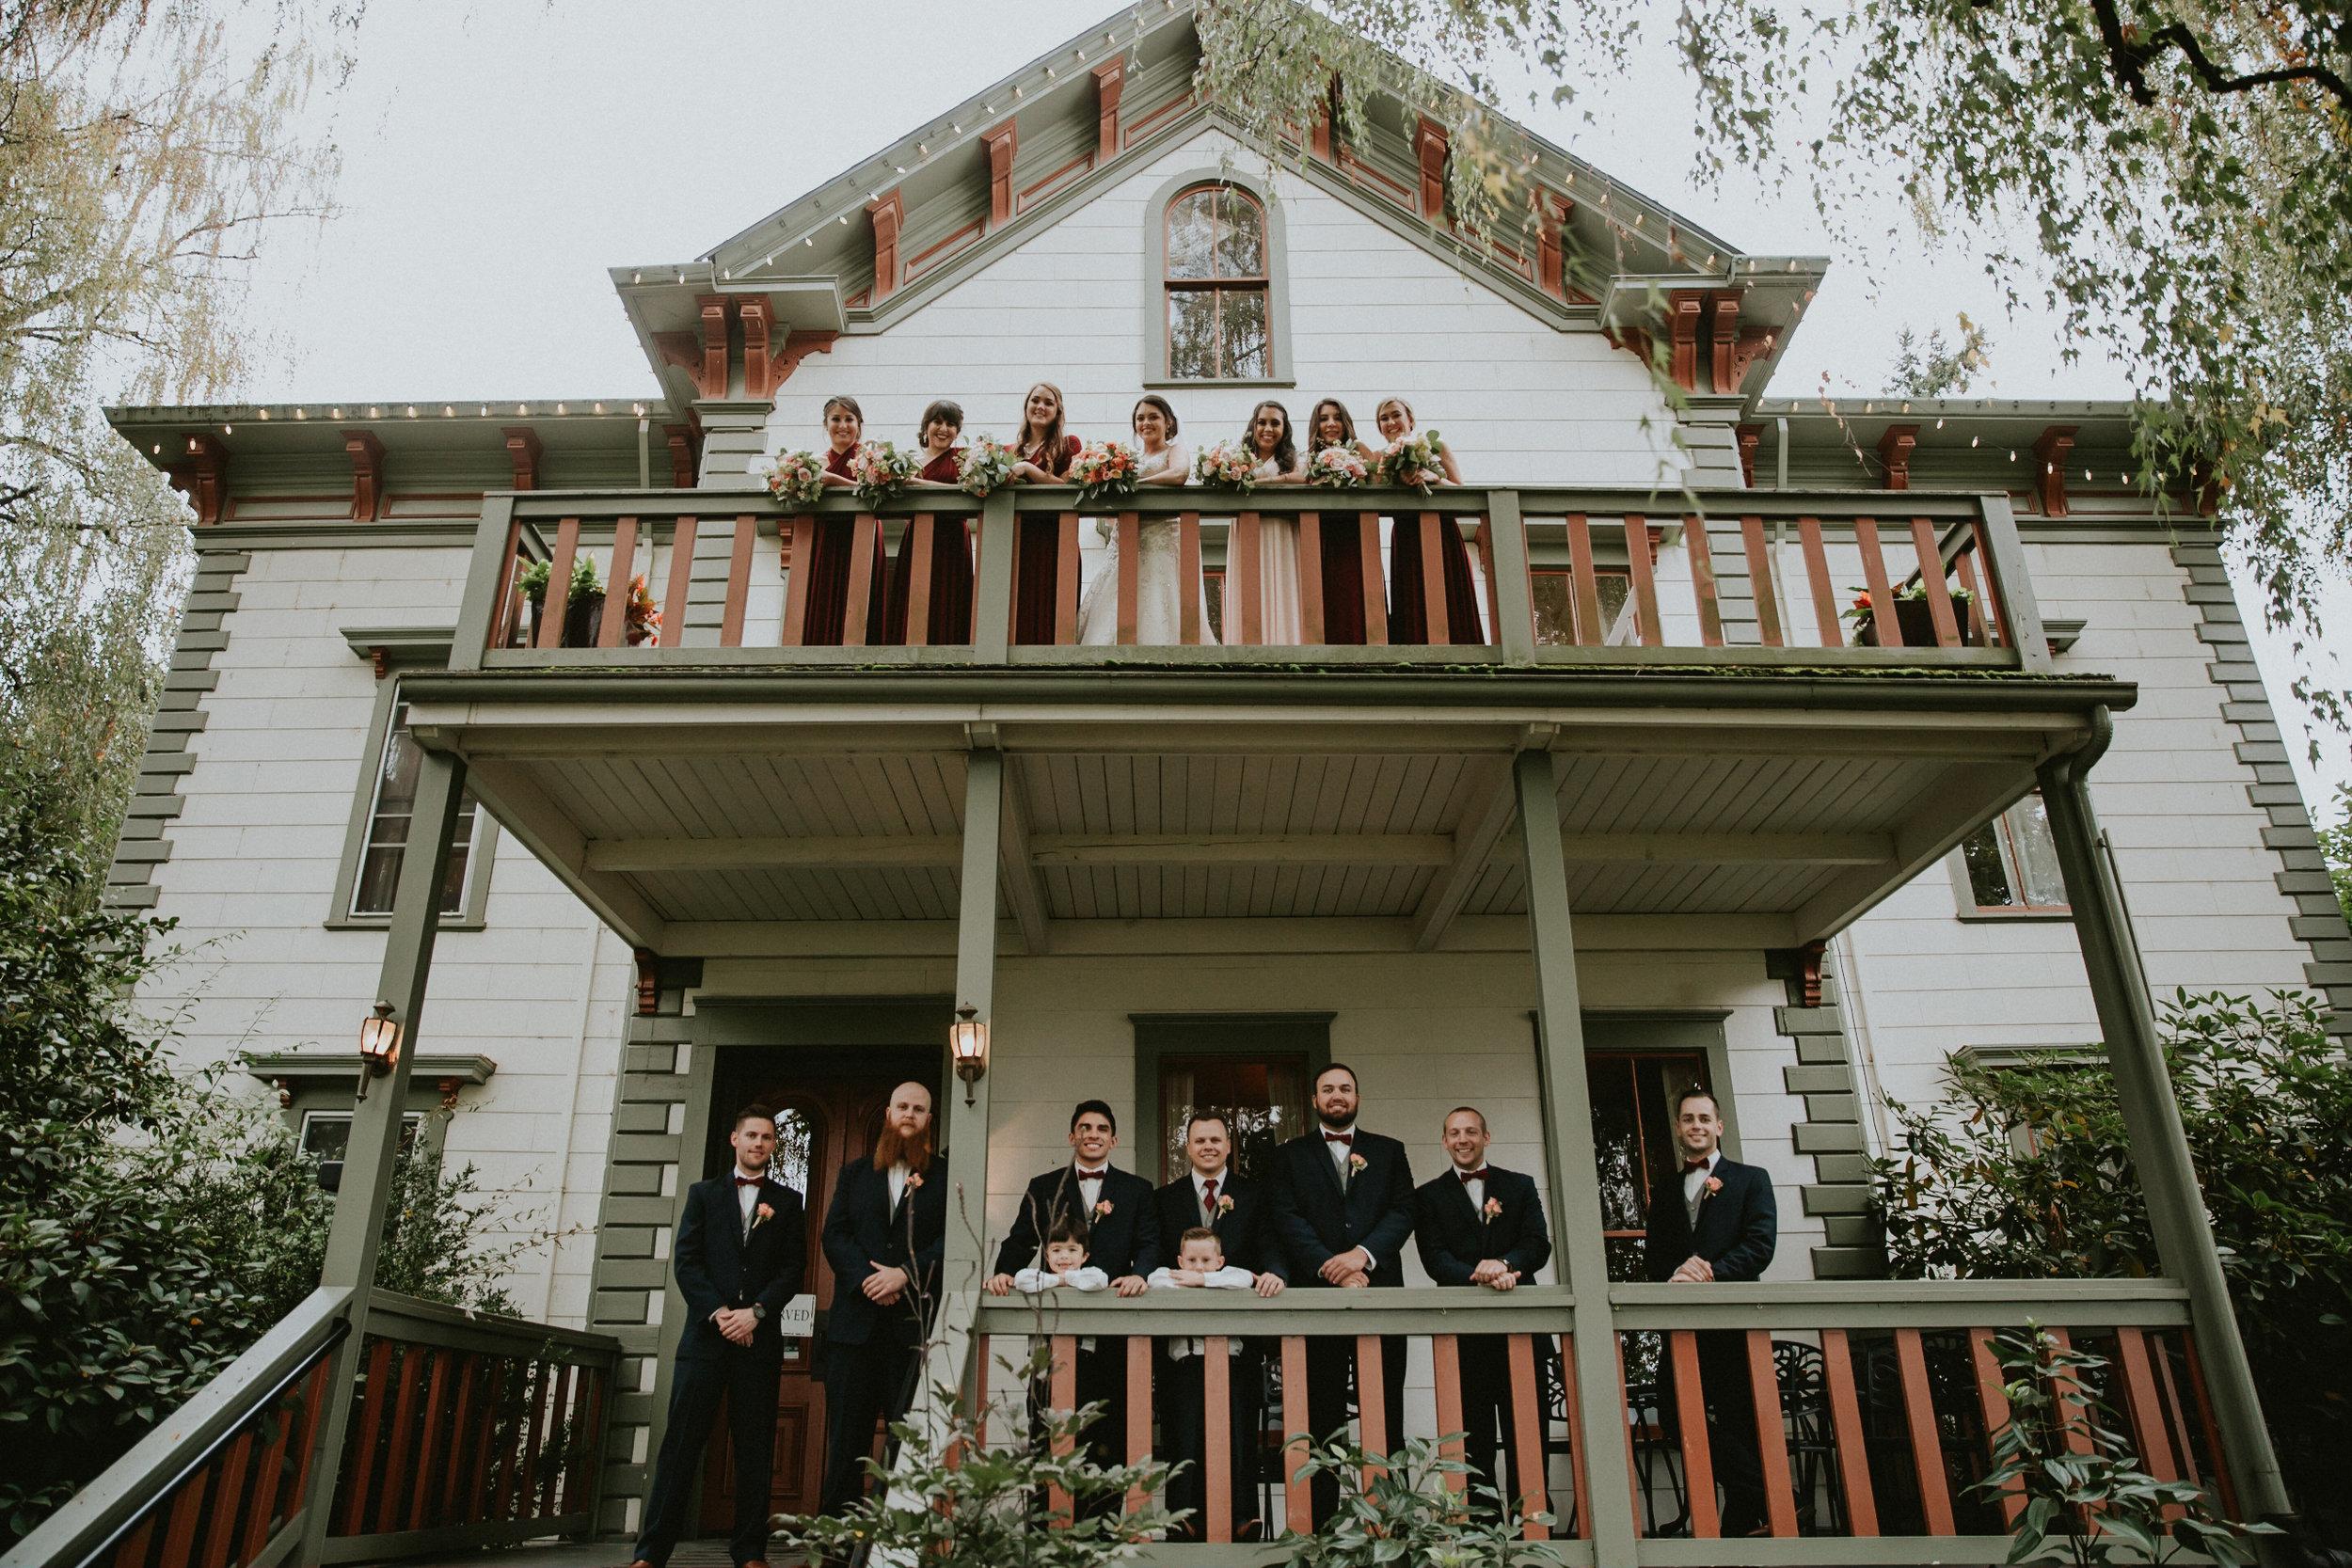 McMenamins_Cornelious_Pass_Roadhouse_wedding_photographer_AlfredTang-3.jpg